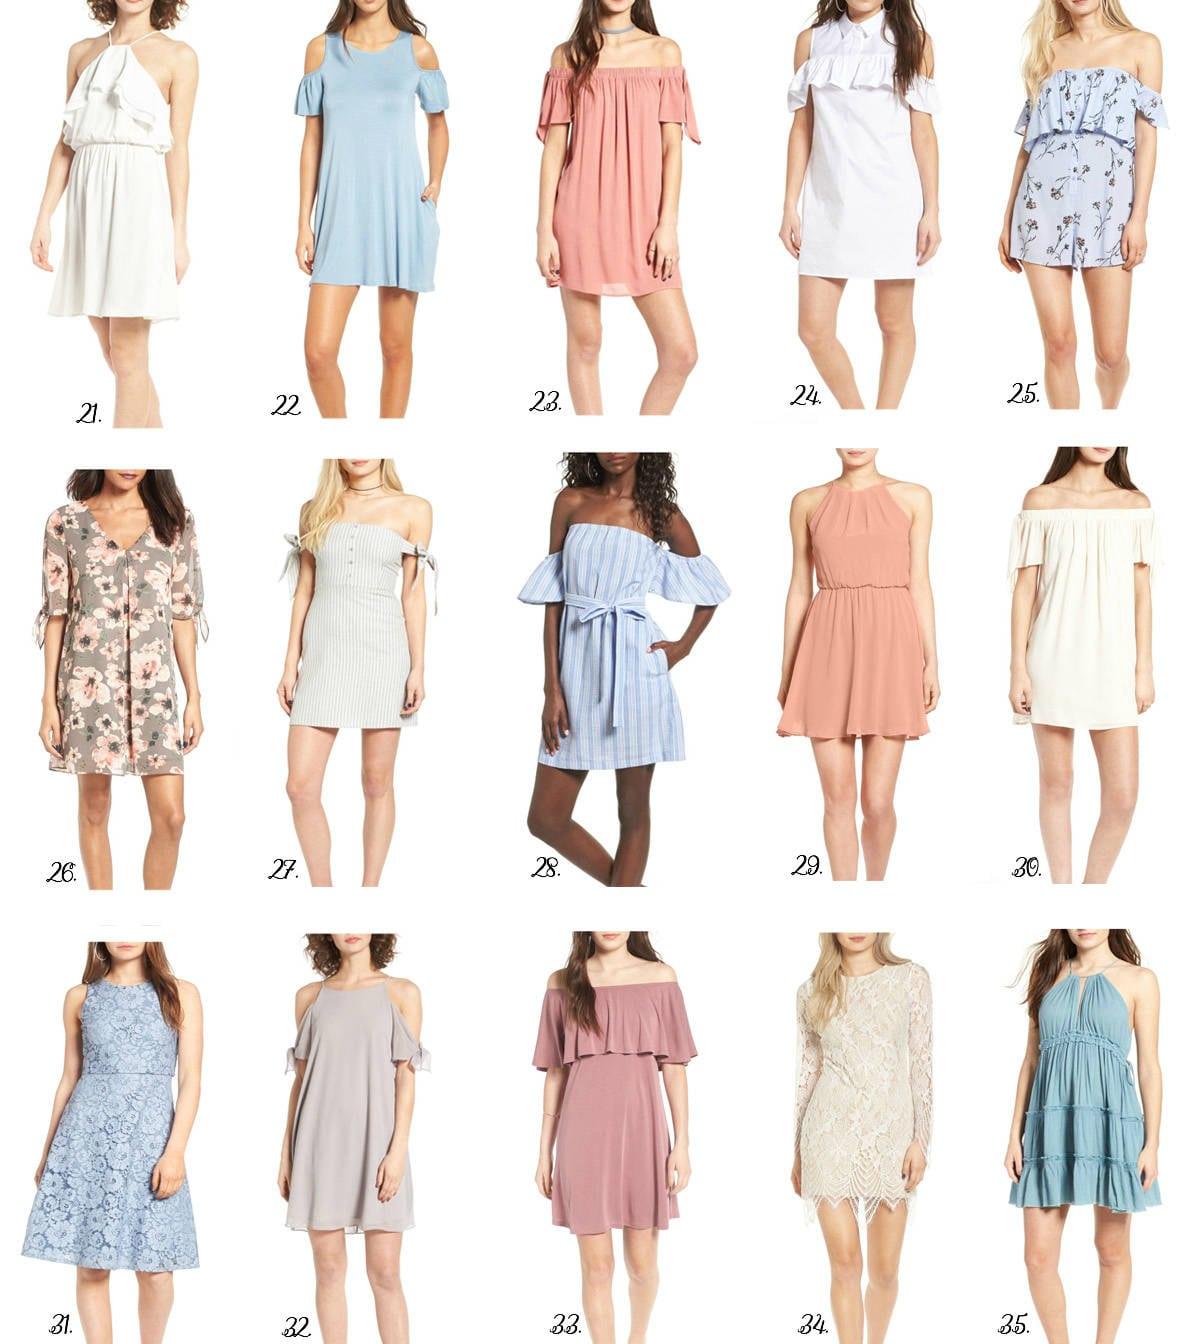 winter dresses | holiday dress ideas | pastel dresses | formal dresses | family dresses | Mash Elle beauty blogger | blue dresses | pink dresses